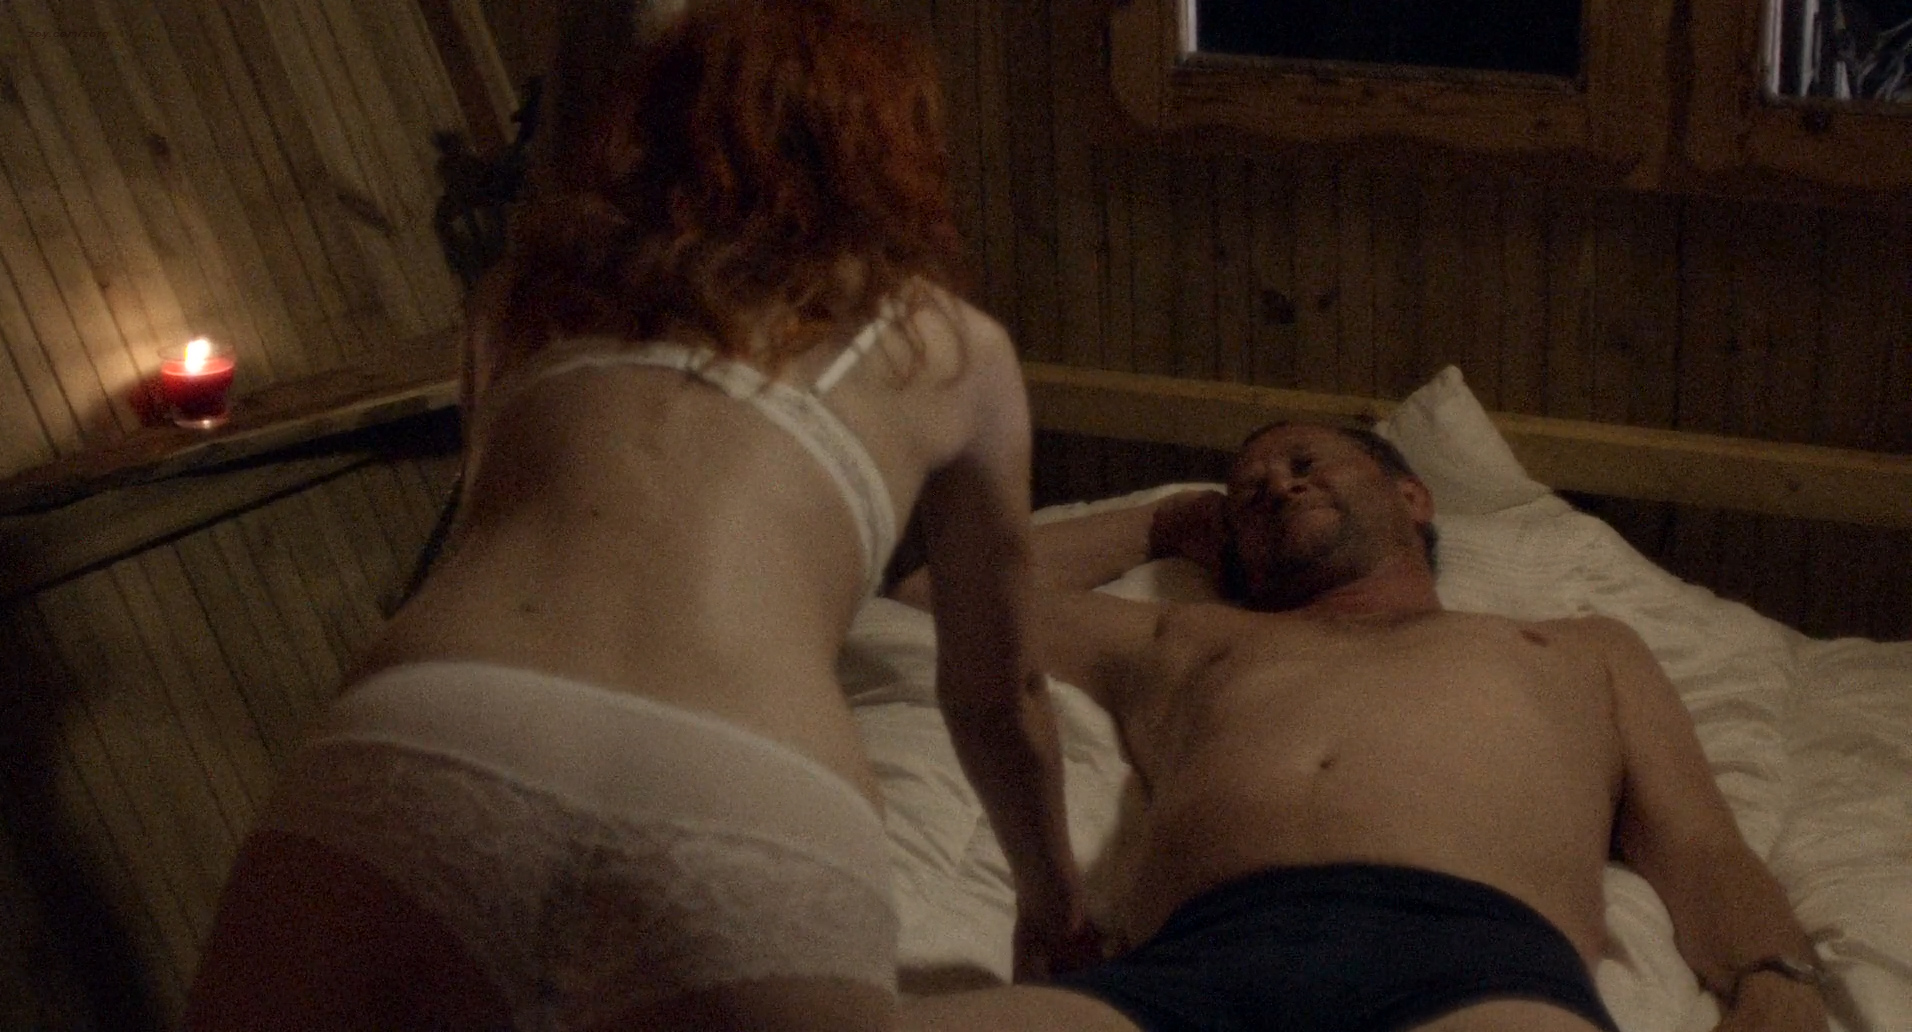 Forum on this topic: Genevieve morton sideboob, ovidie-topless/